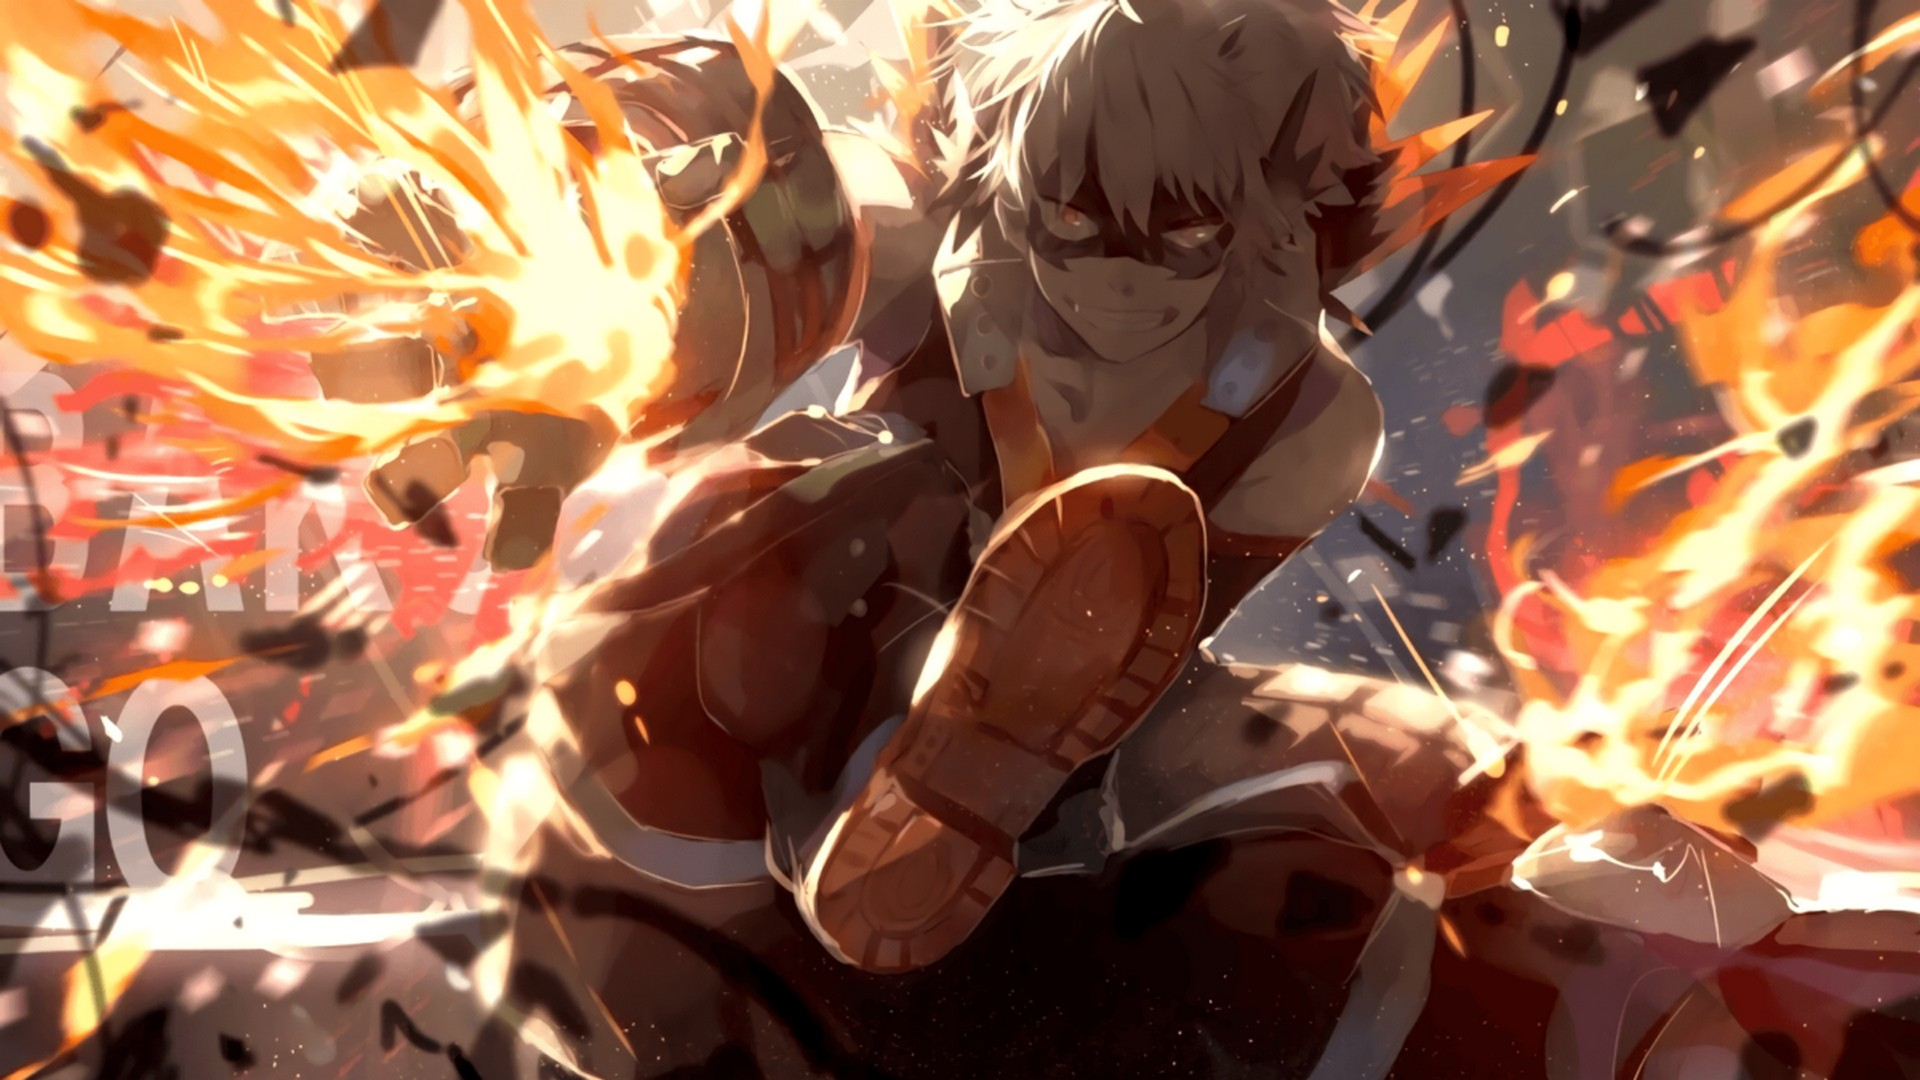 Resolution hd, ultra hd, 4k, 5k. My Hero Academia Anime Trailer Wallpaper | 2021 Movie ...